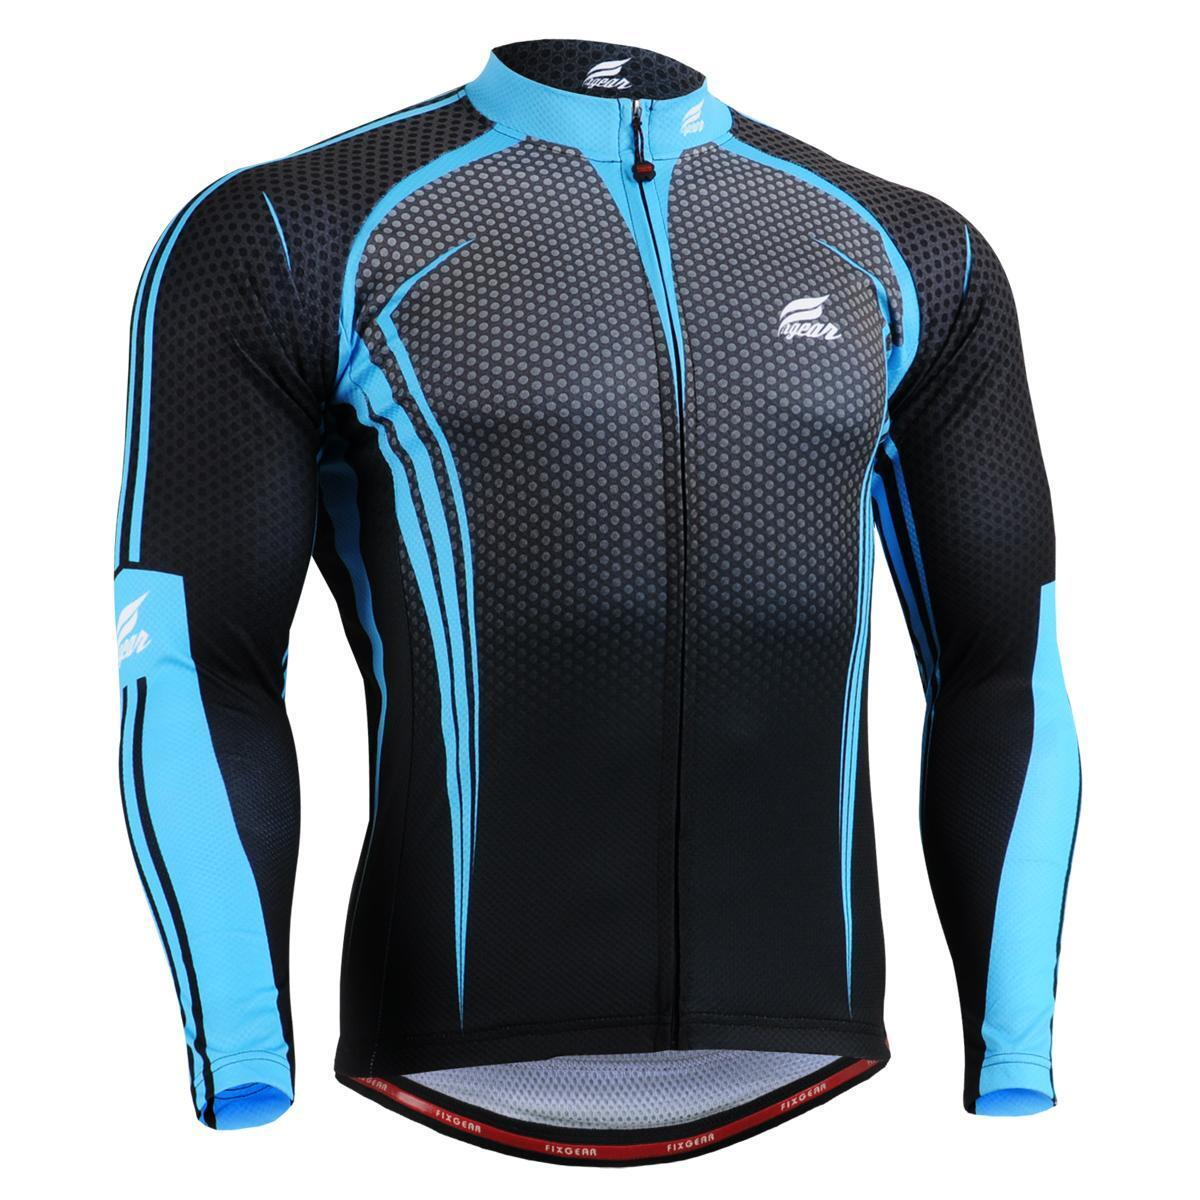 FIXGEAR CS-5601 Men's Long Sleeve Cycling Jersey Bicycle Apparel Roadbike MTB